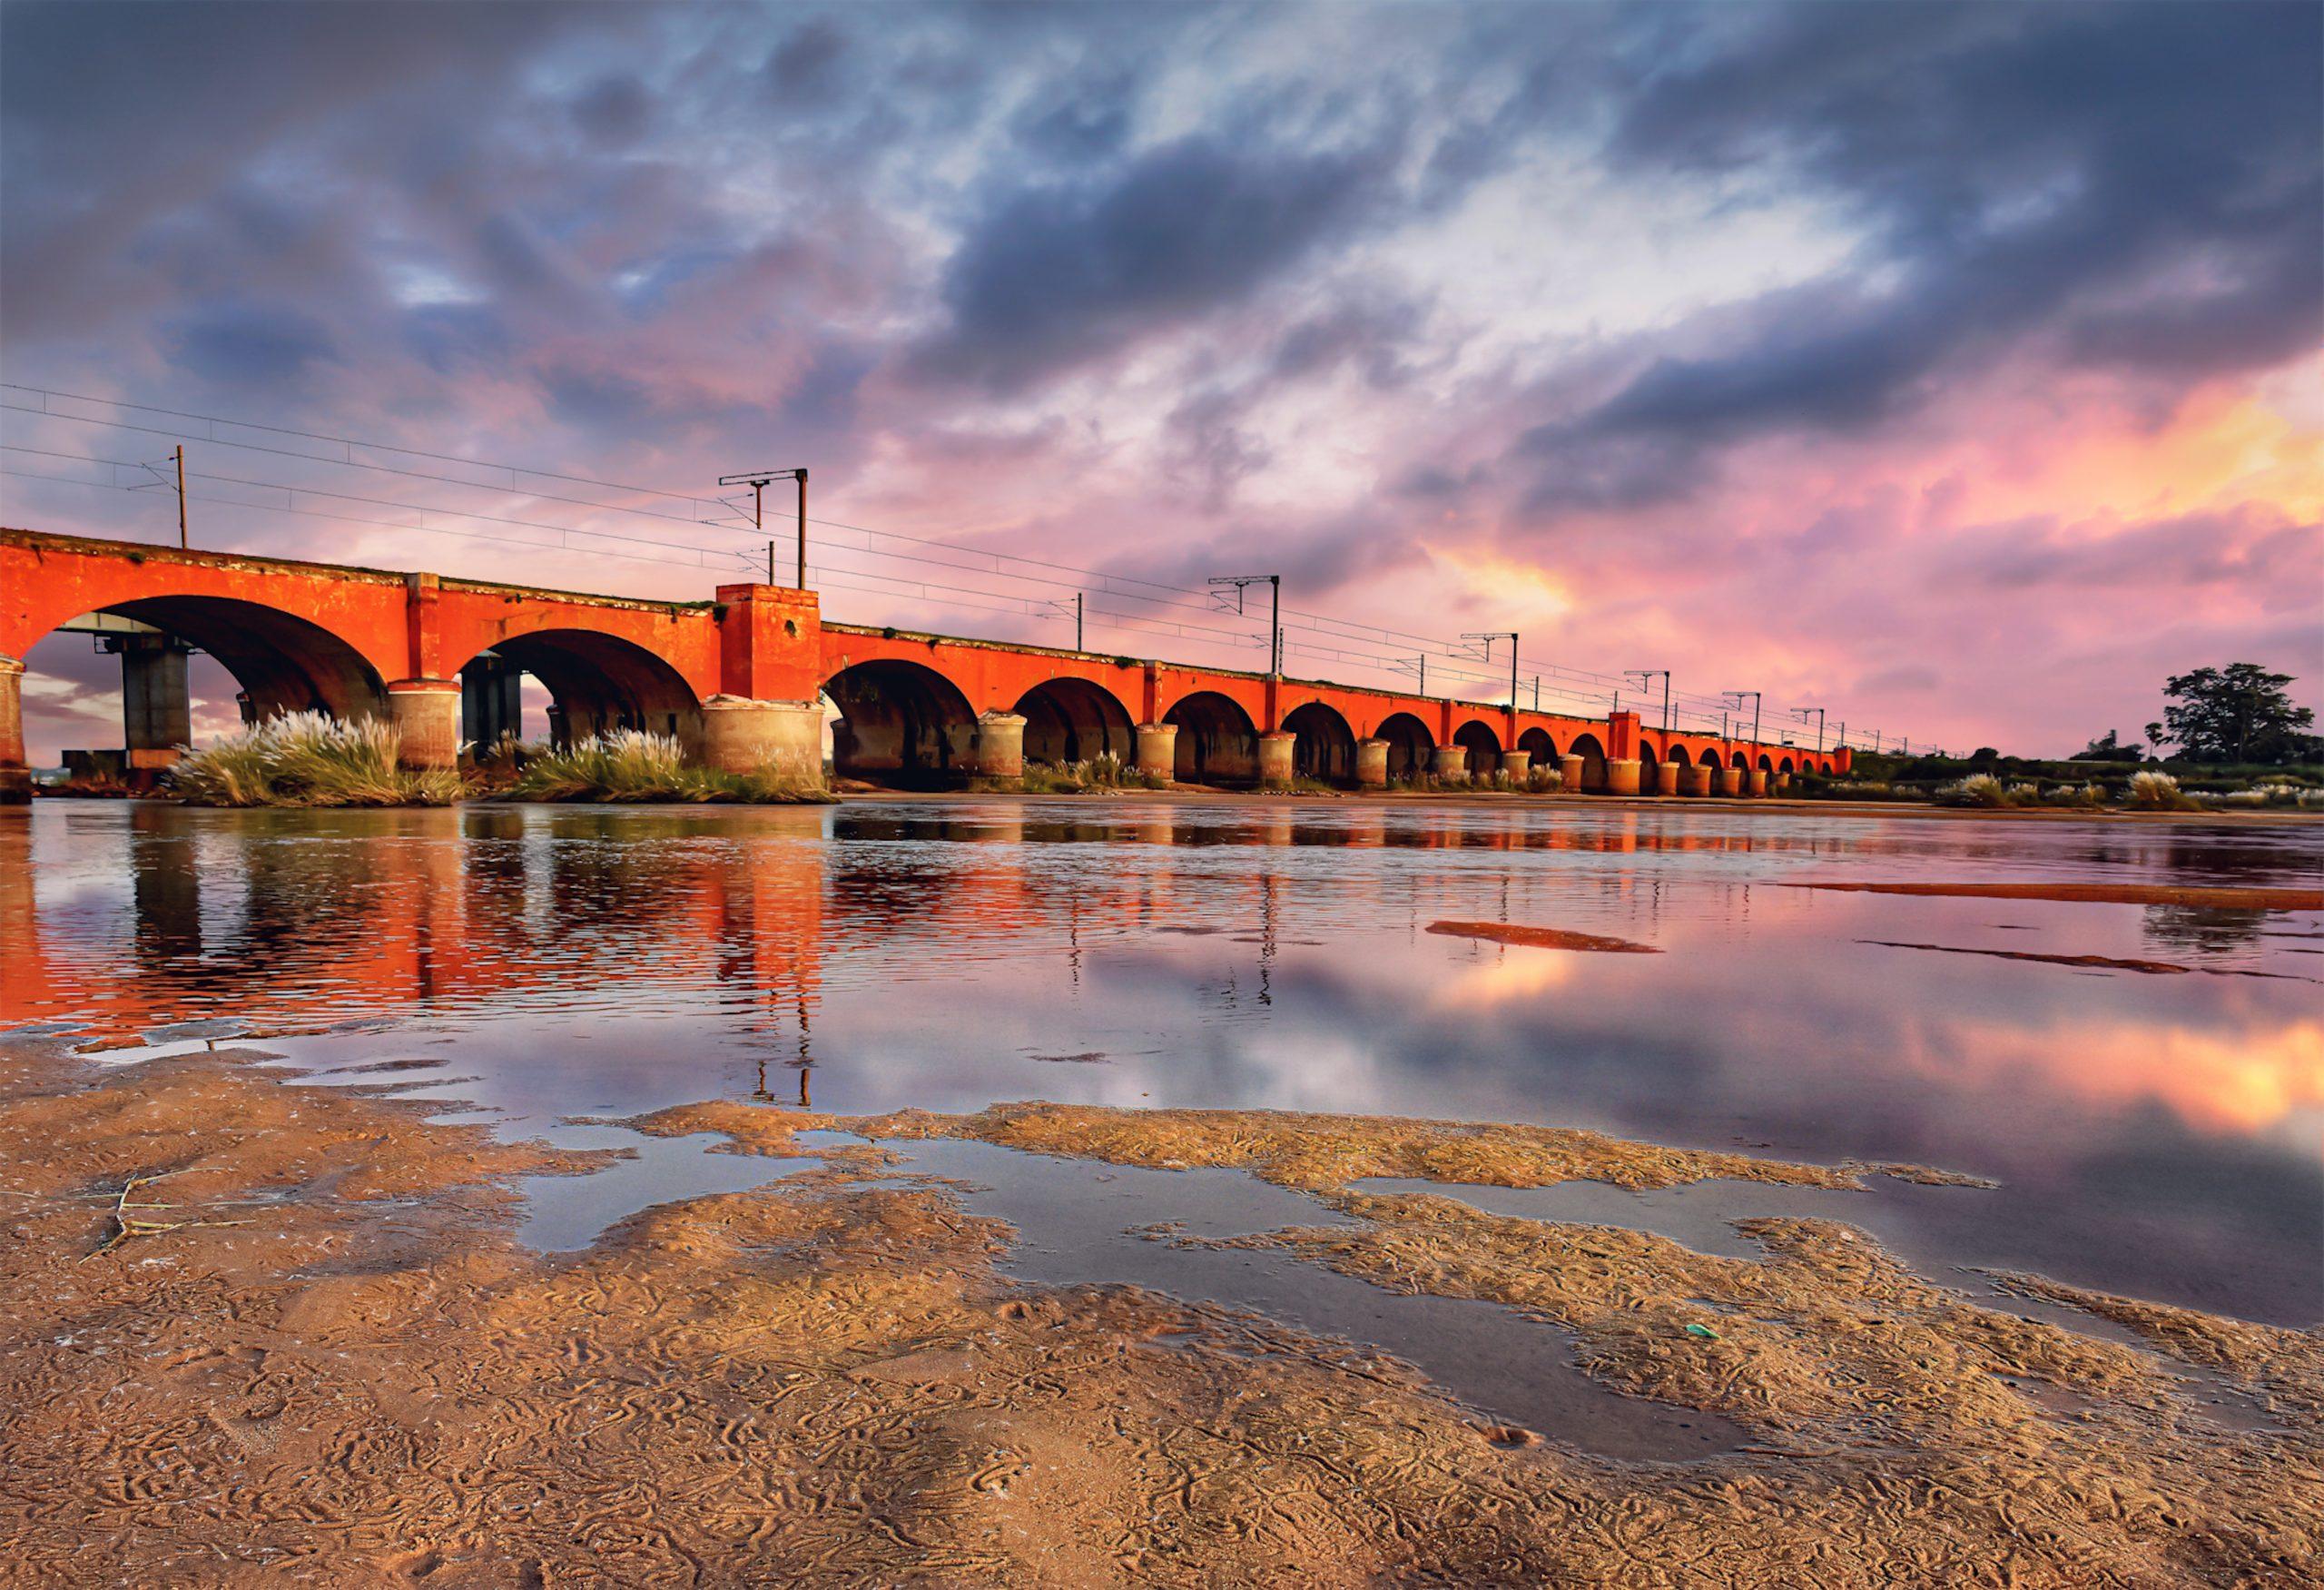 Clouds over a red bridge